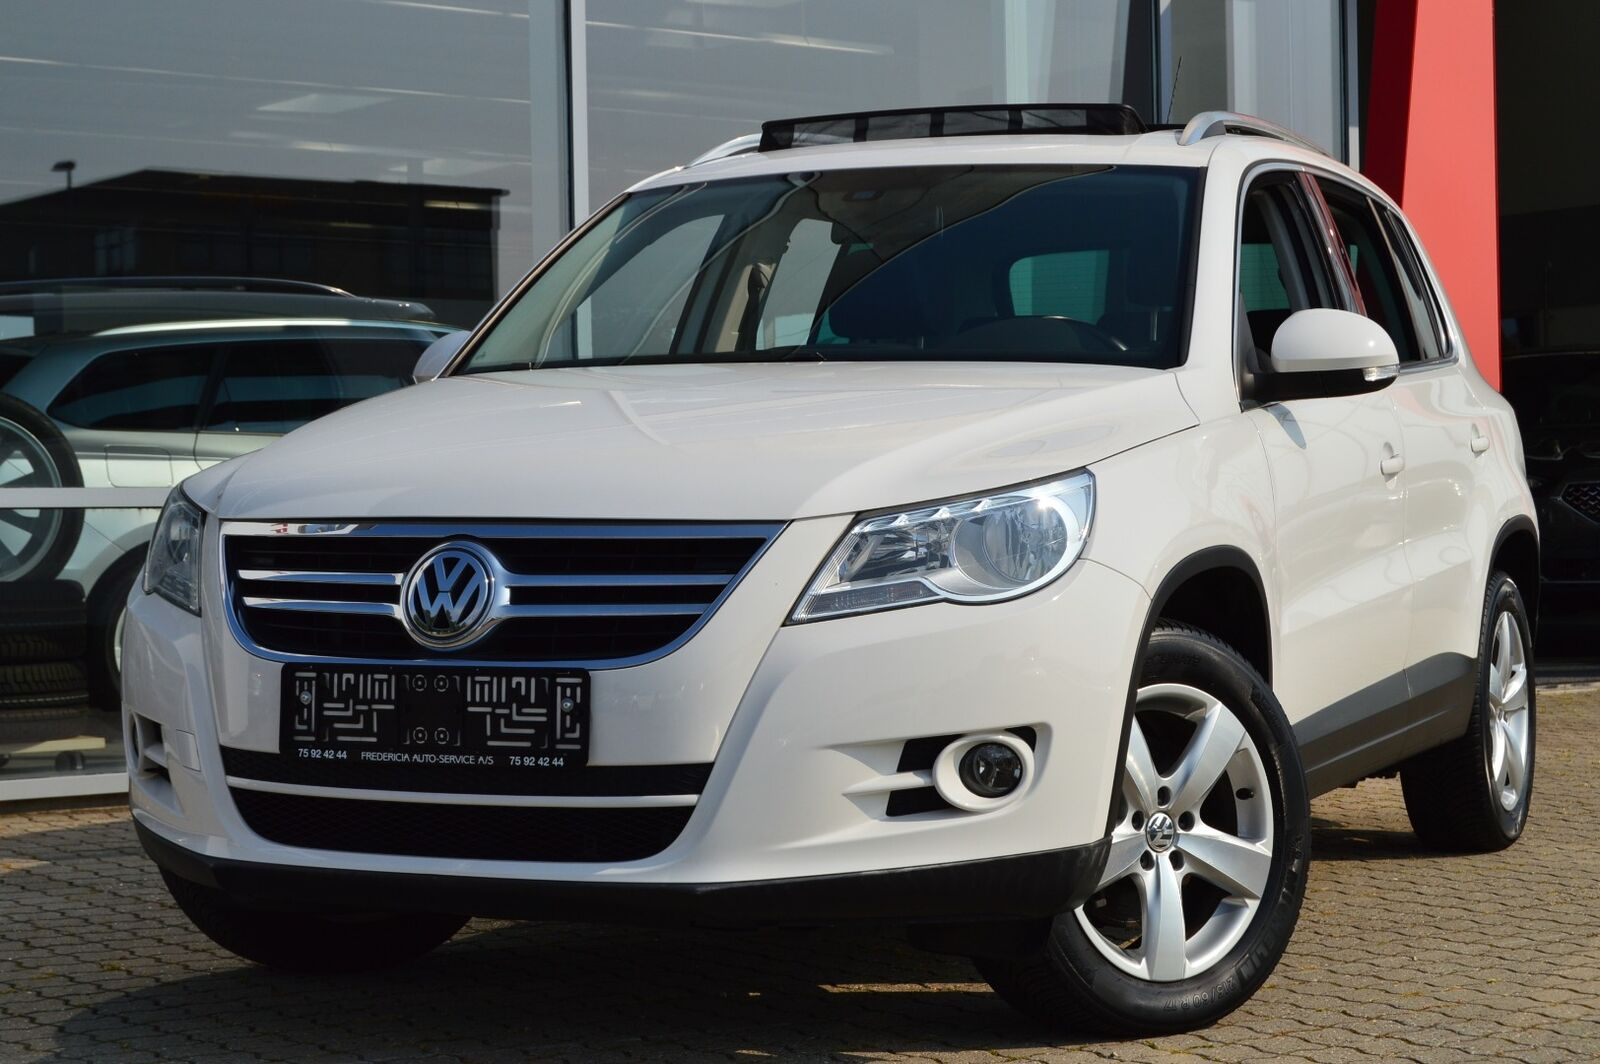 VW Tiguan 1,4 TSi 150 Sport & Style BMT 5d - 149.900 kr.